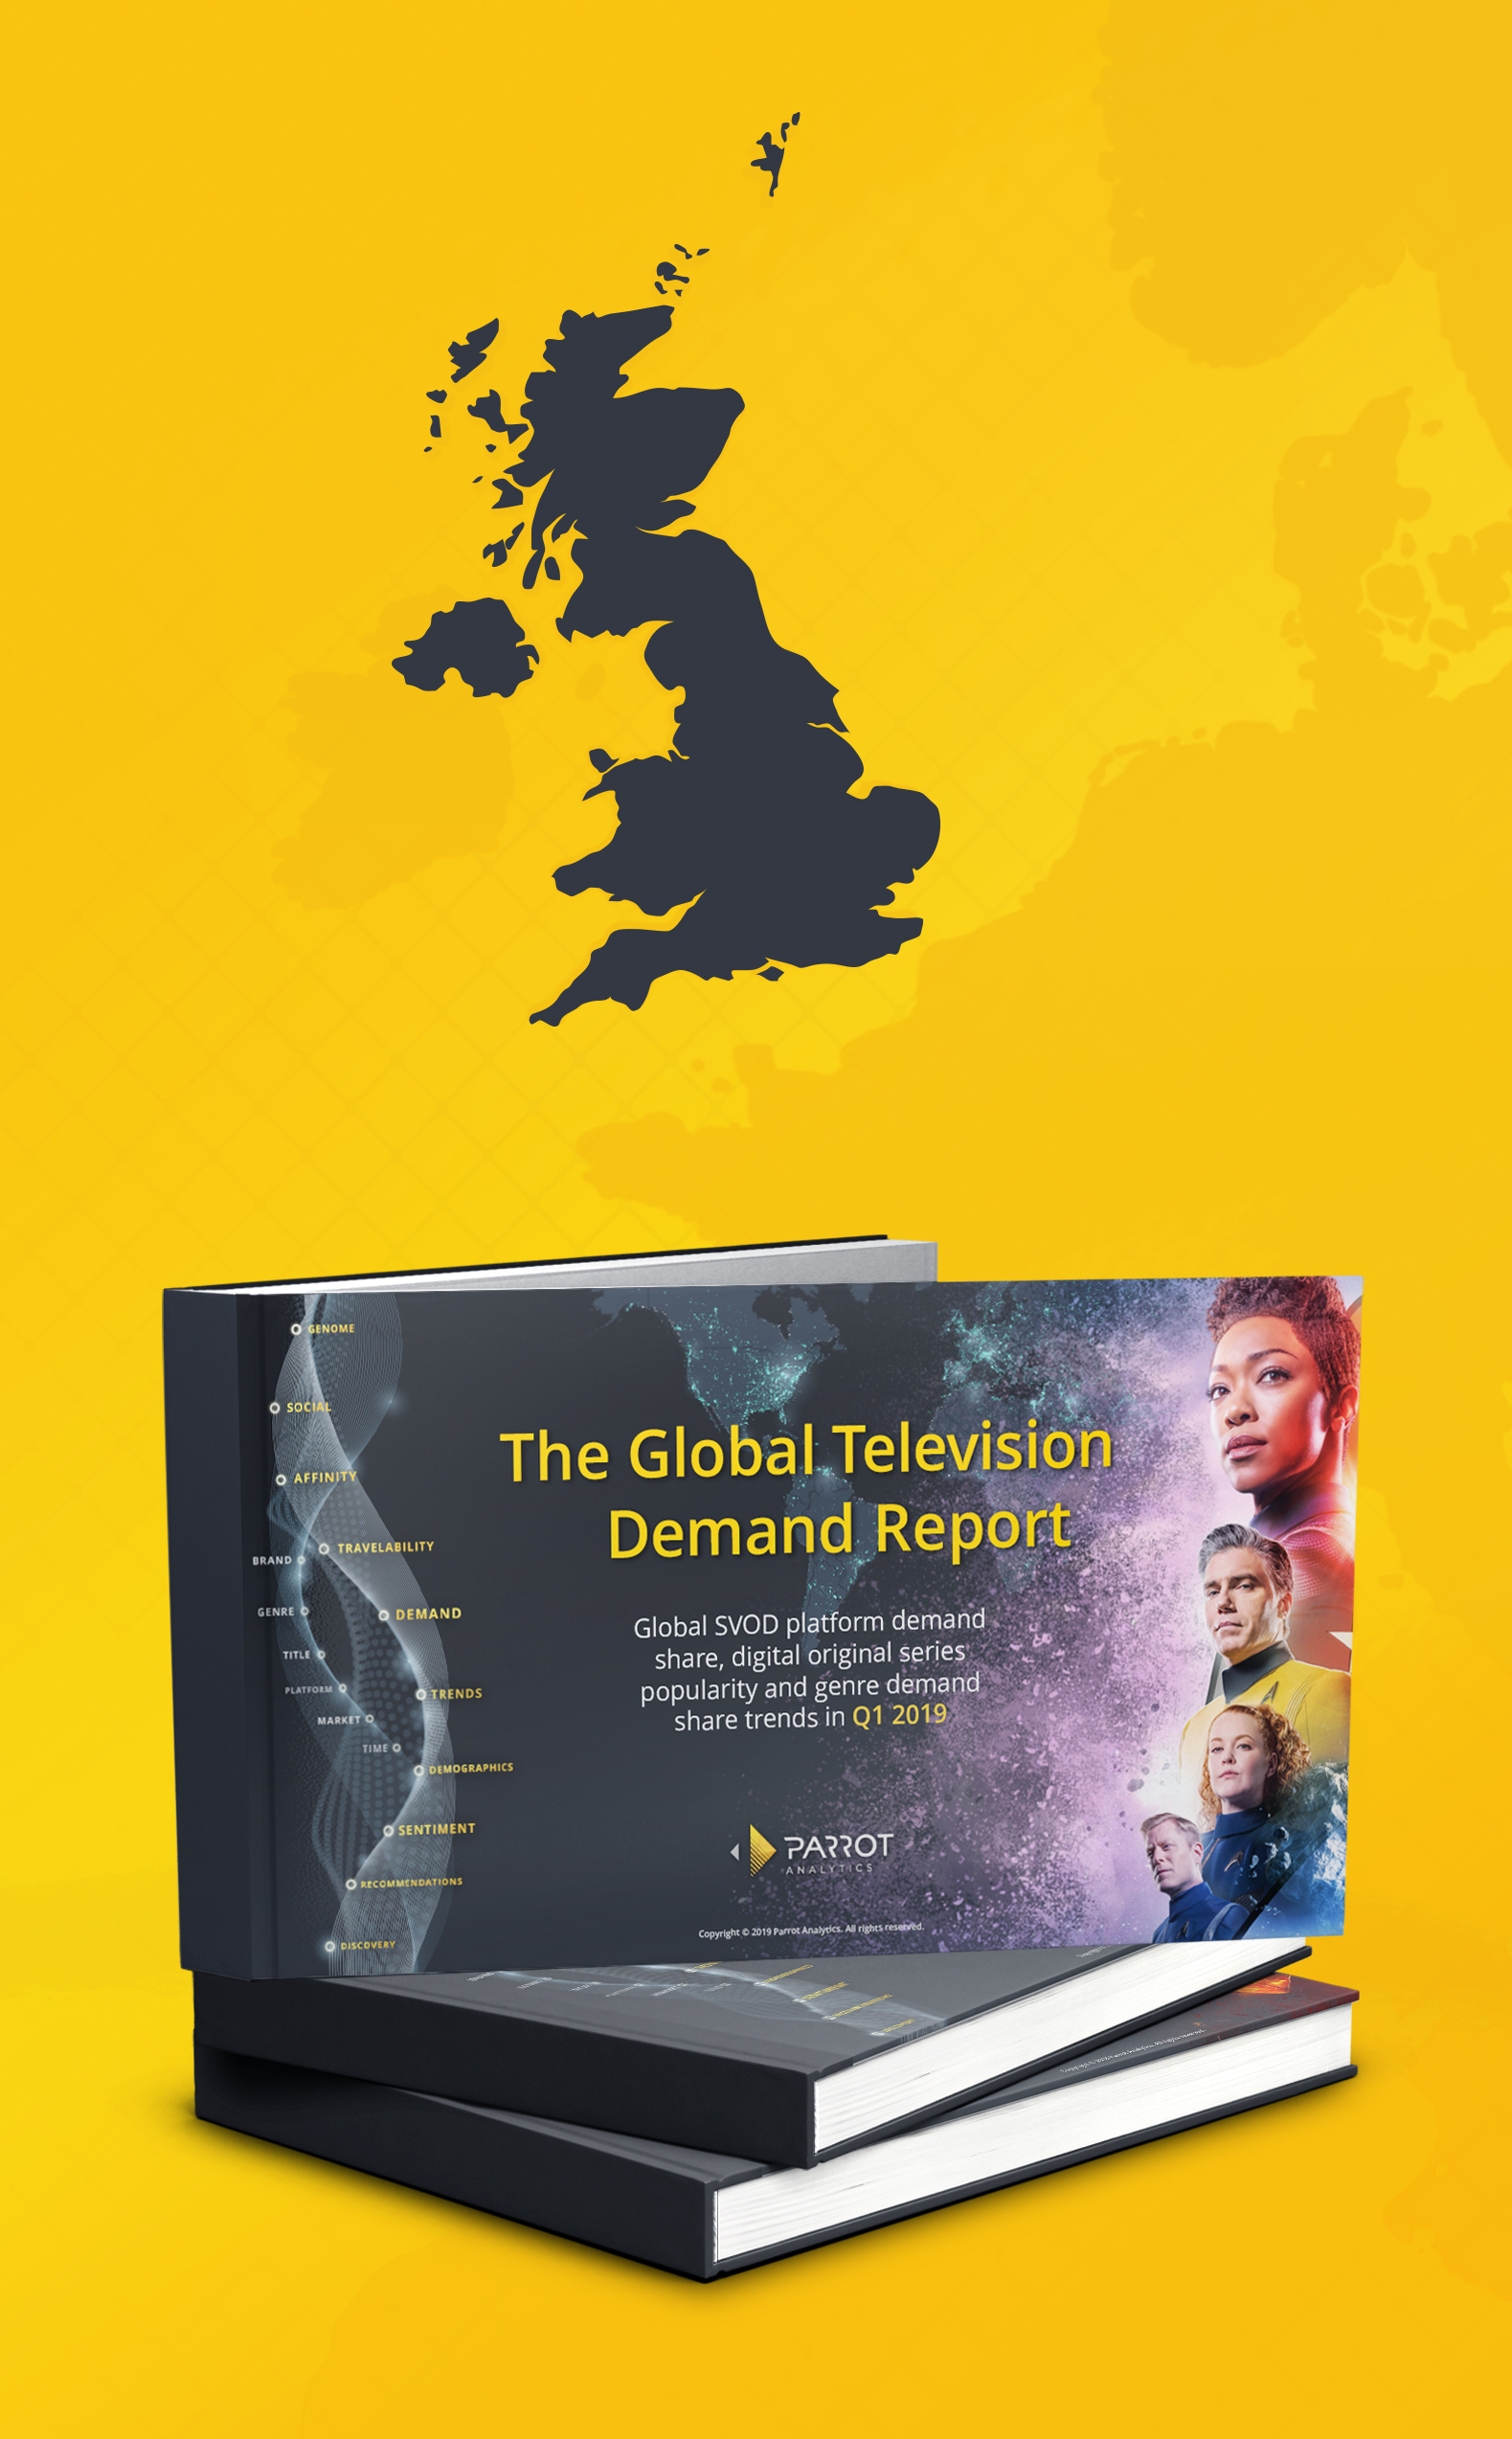 The United Kingdom SVOD Market Demand Report 2019